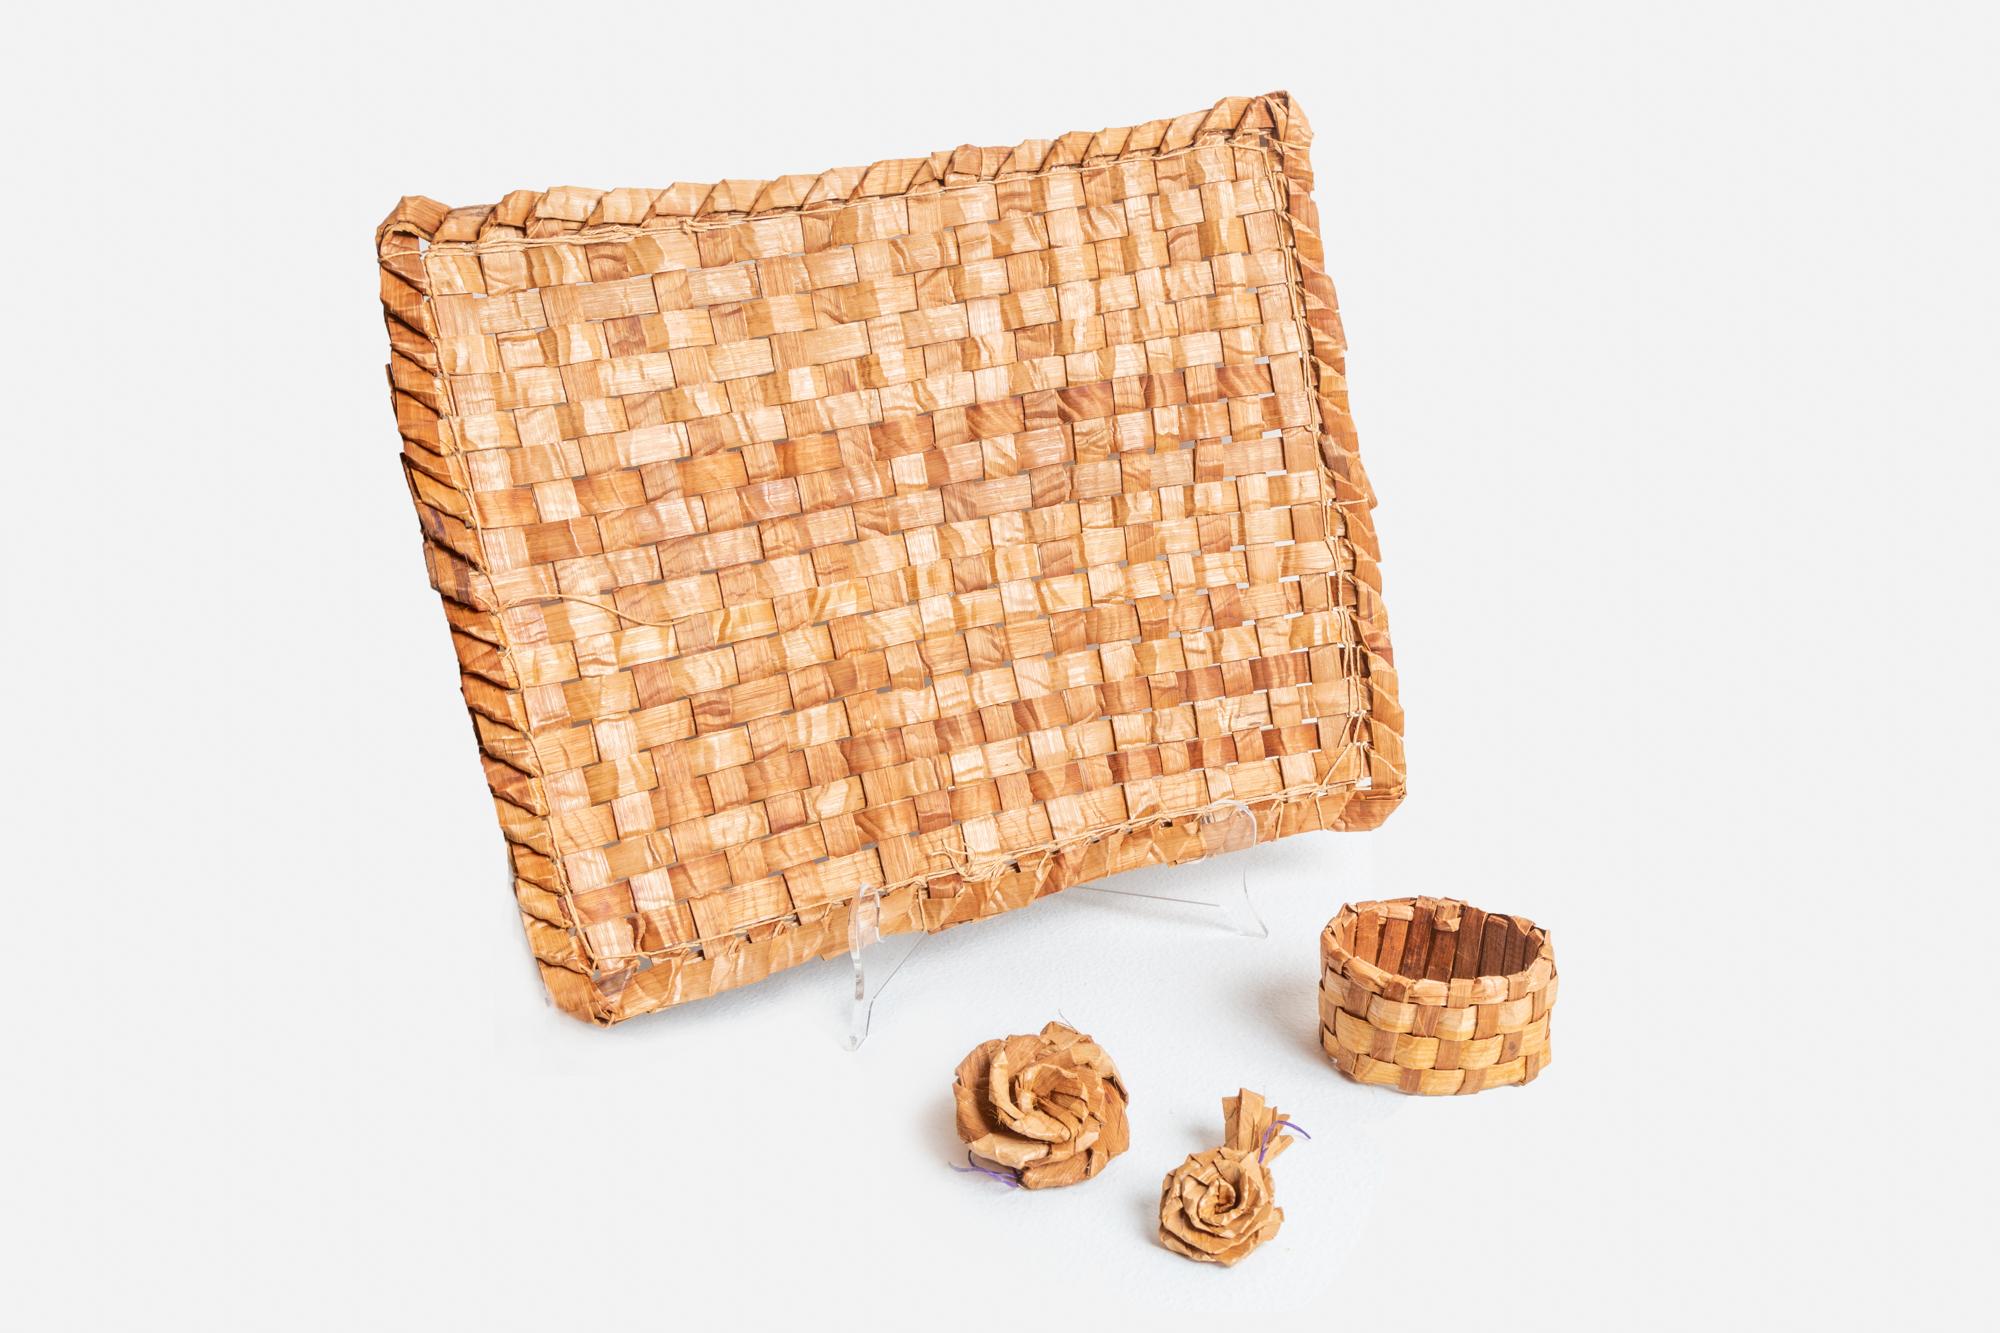 Cedar Mat, Bracelet, and Roses